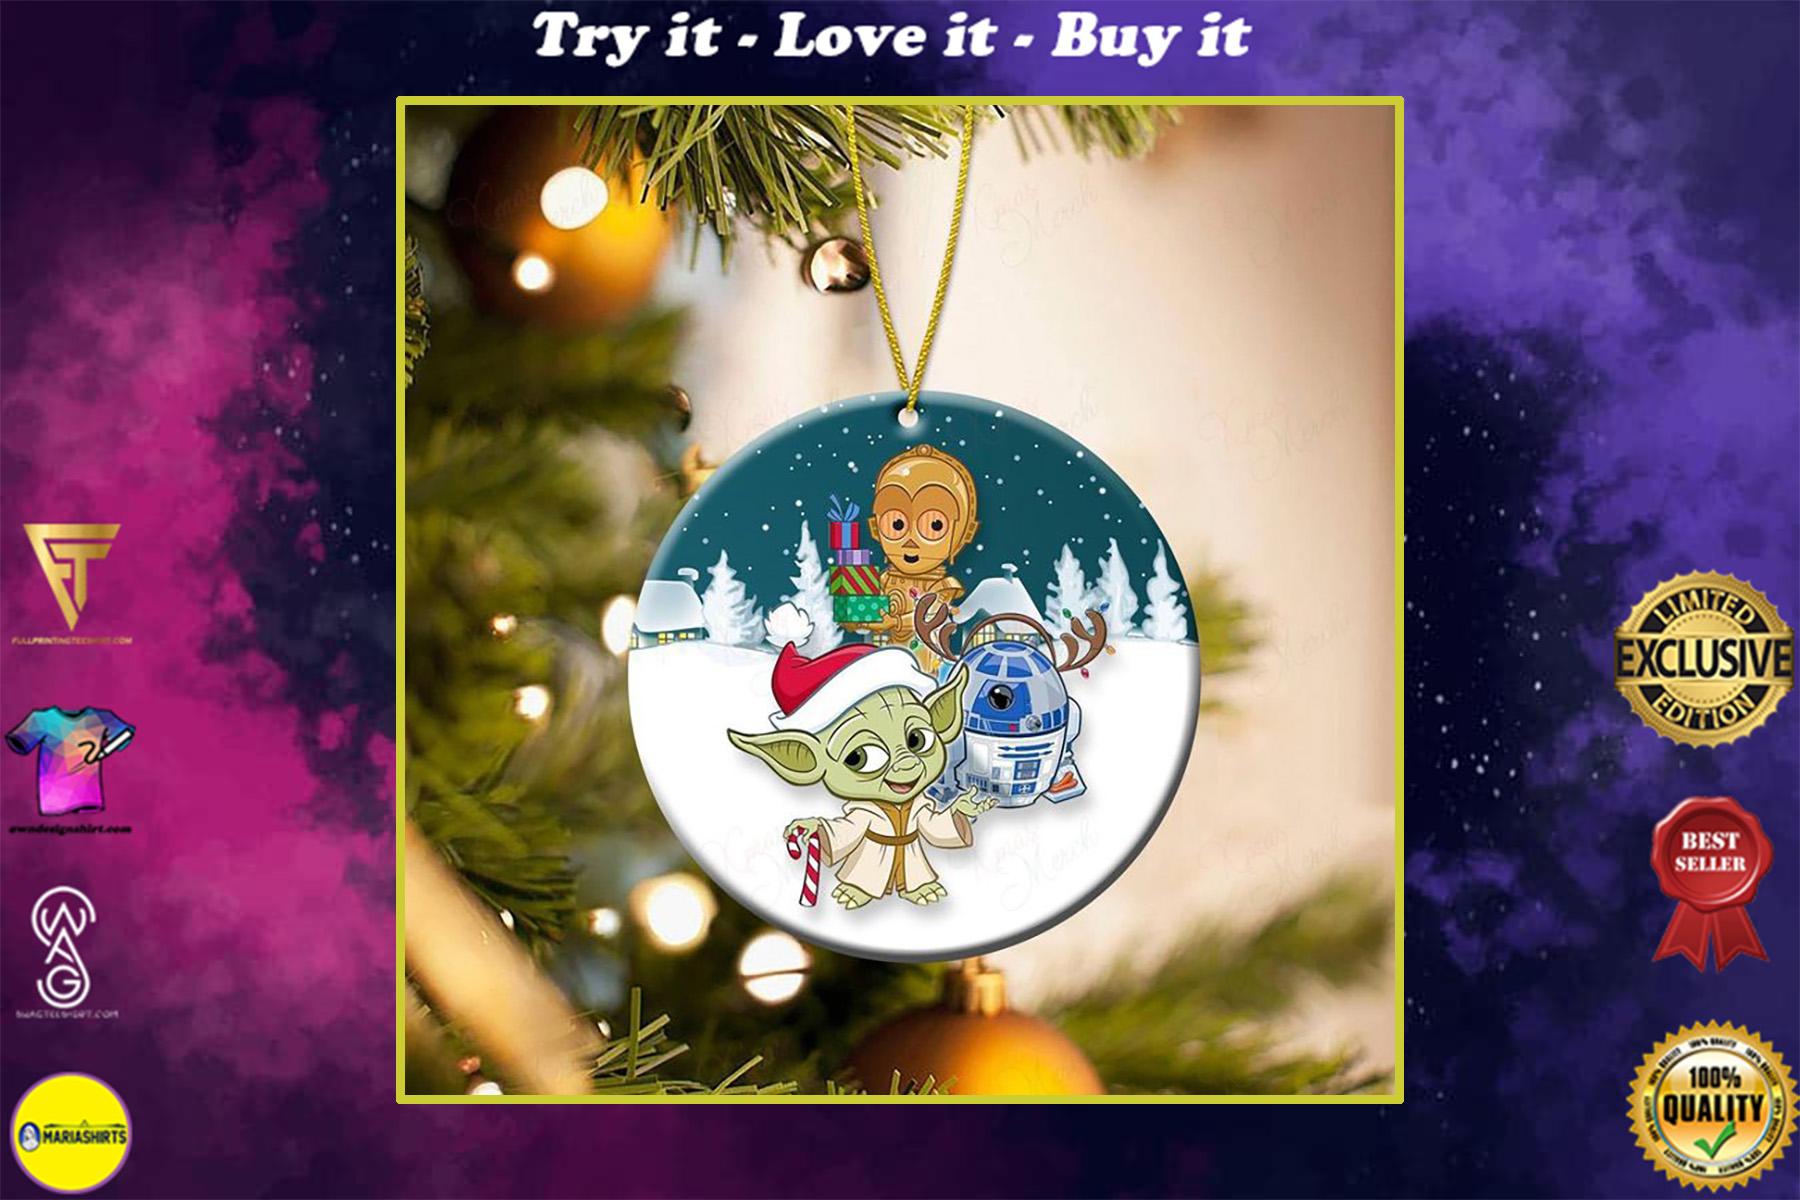 star wars yoda r2-d2 and c-3po christmas ornament